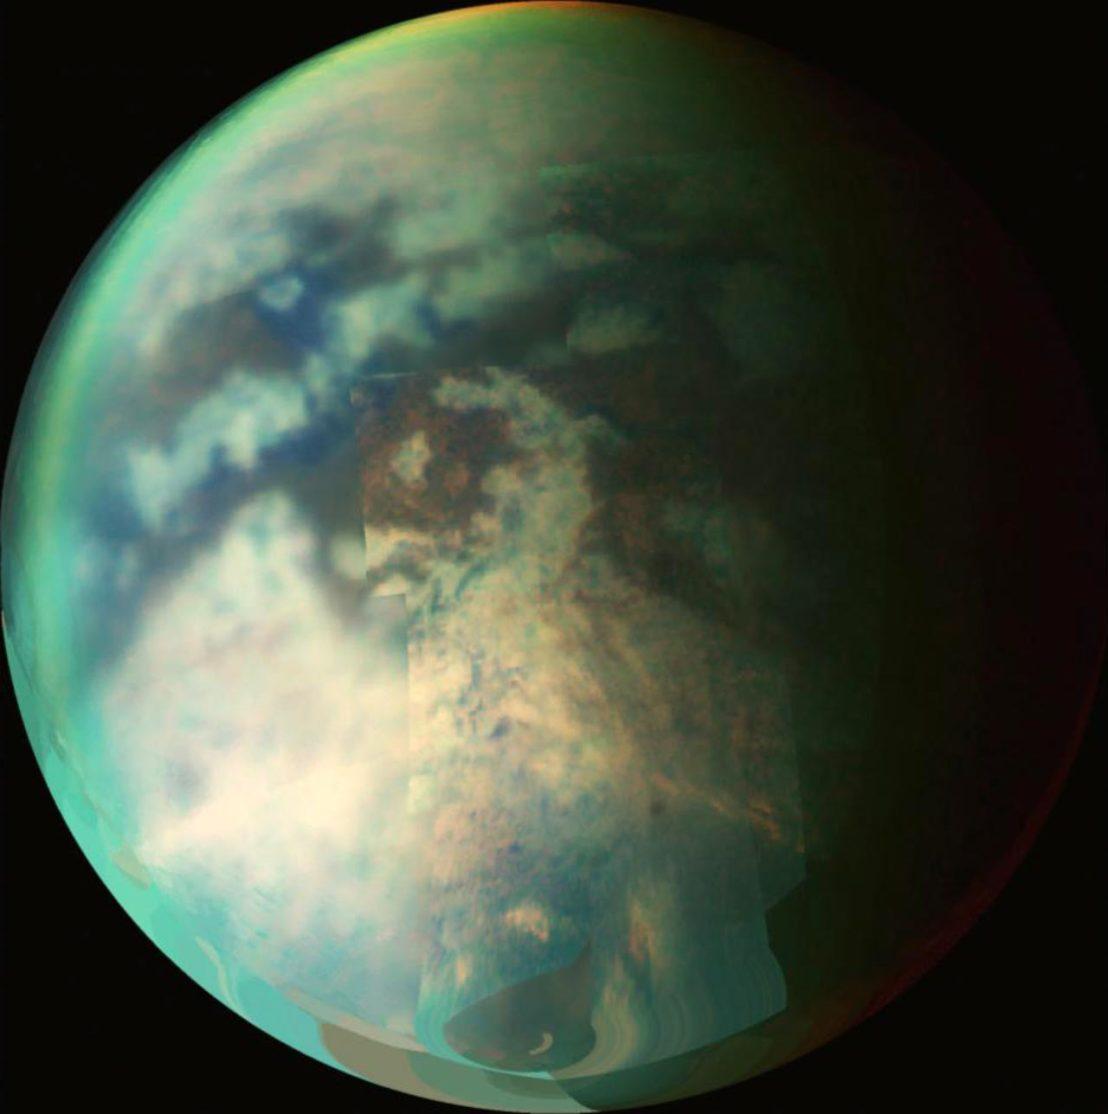 Does Titan have an undergroundOcean?